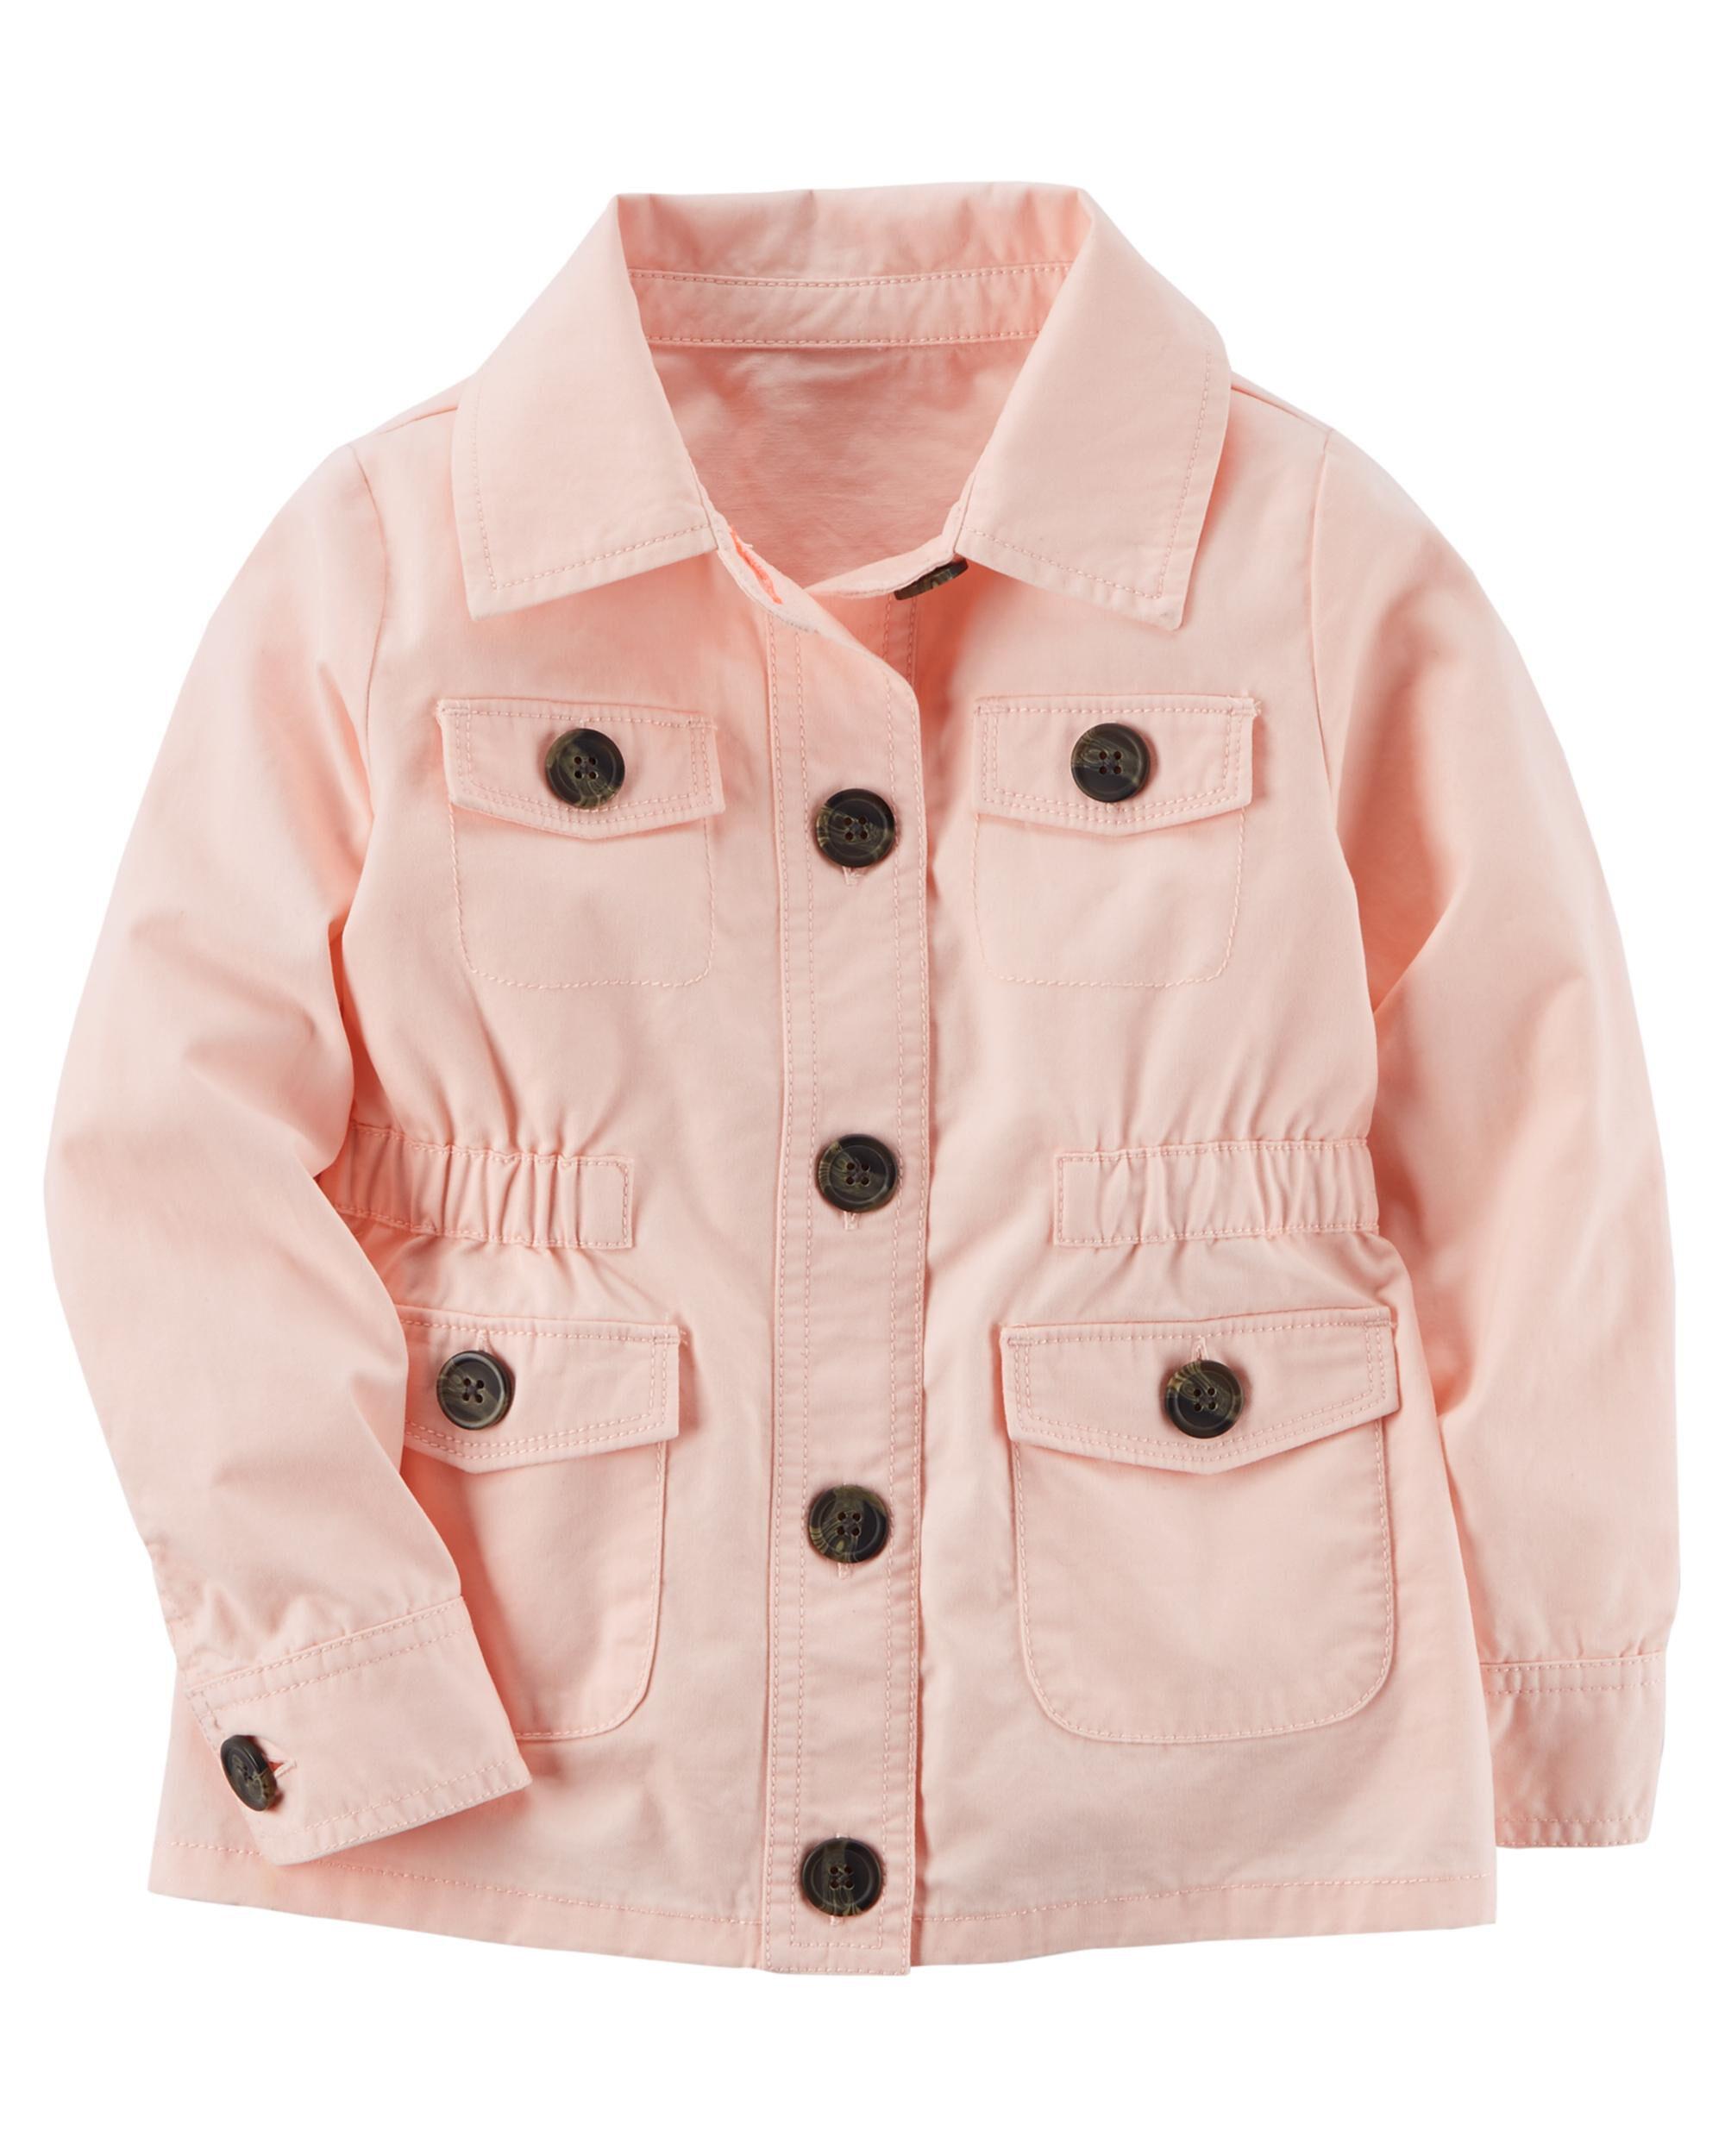 twill jacket carters com rh carters com outerwear fahrenheit outerwear jacke damen